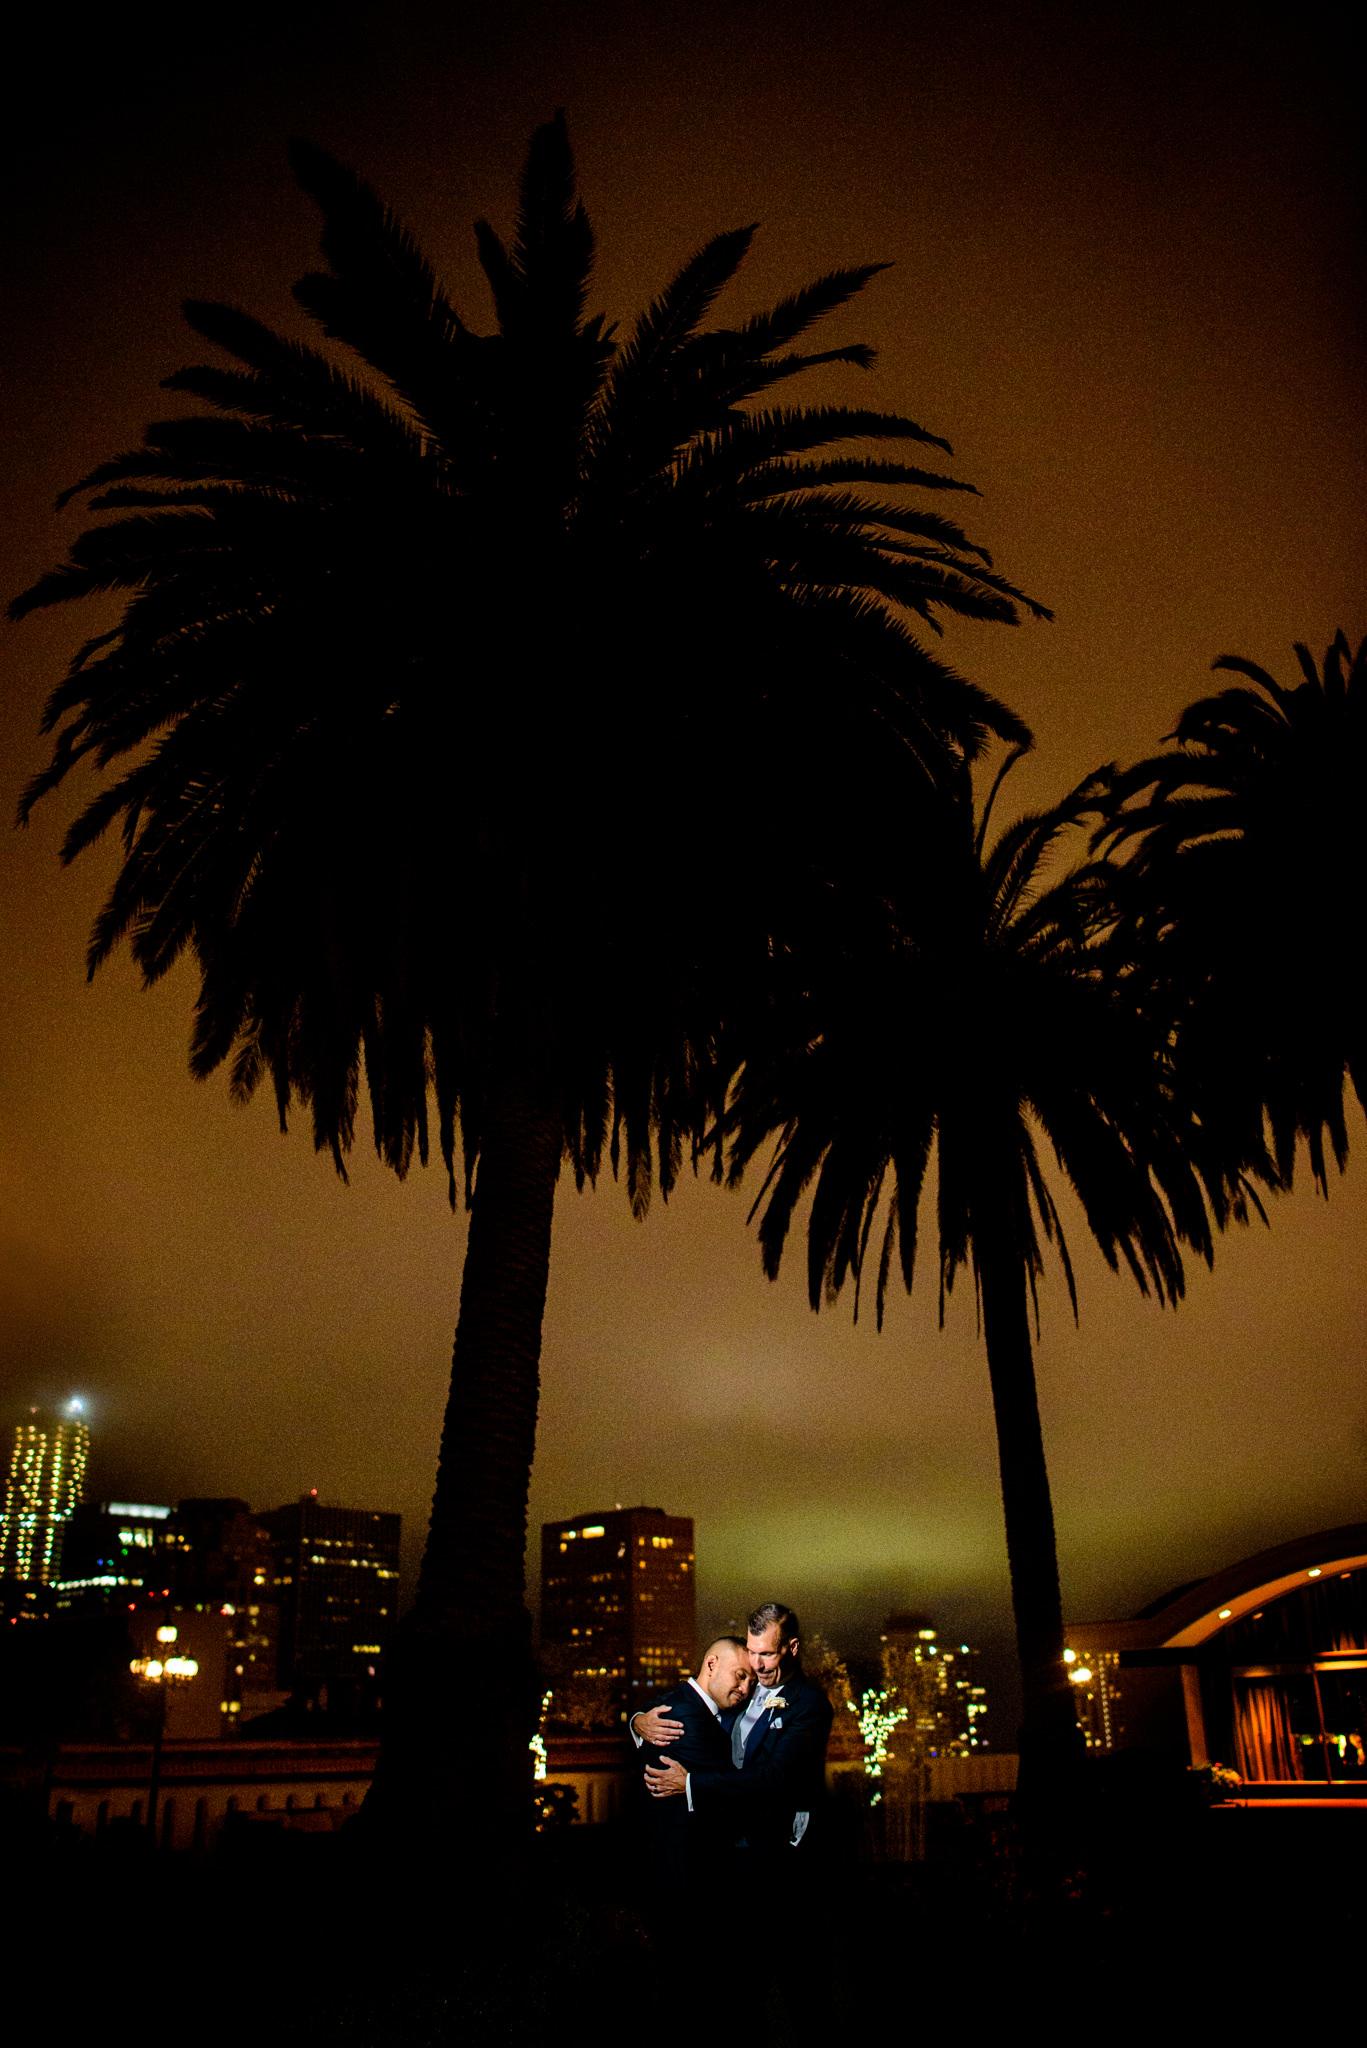 Fairmont hotel, San Francisco, CA.